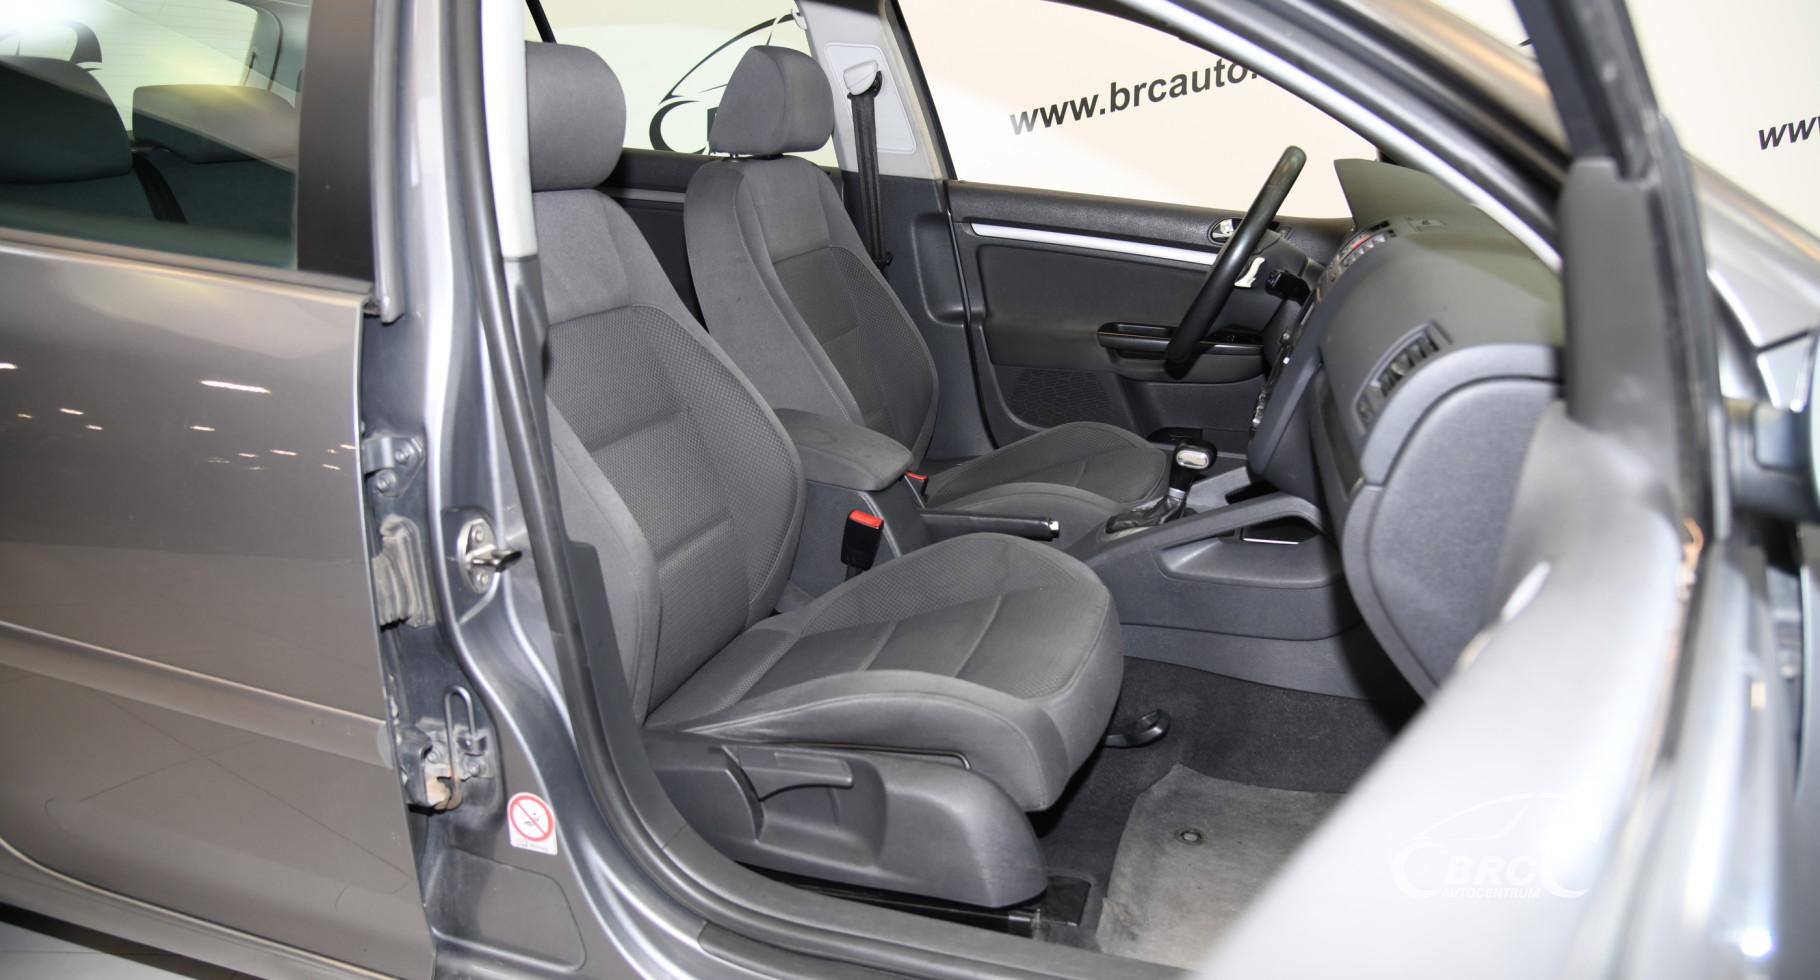 Volkswagen Golf 2.0 TDI DSG Automatas